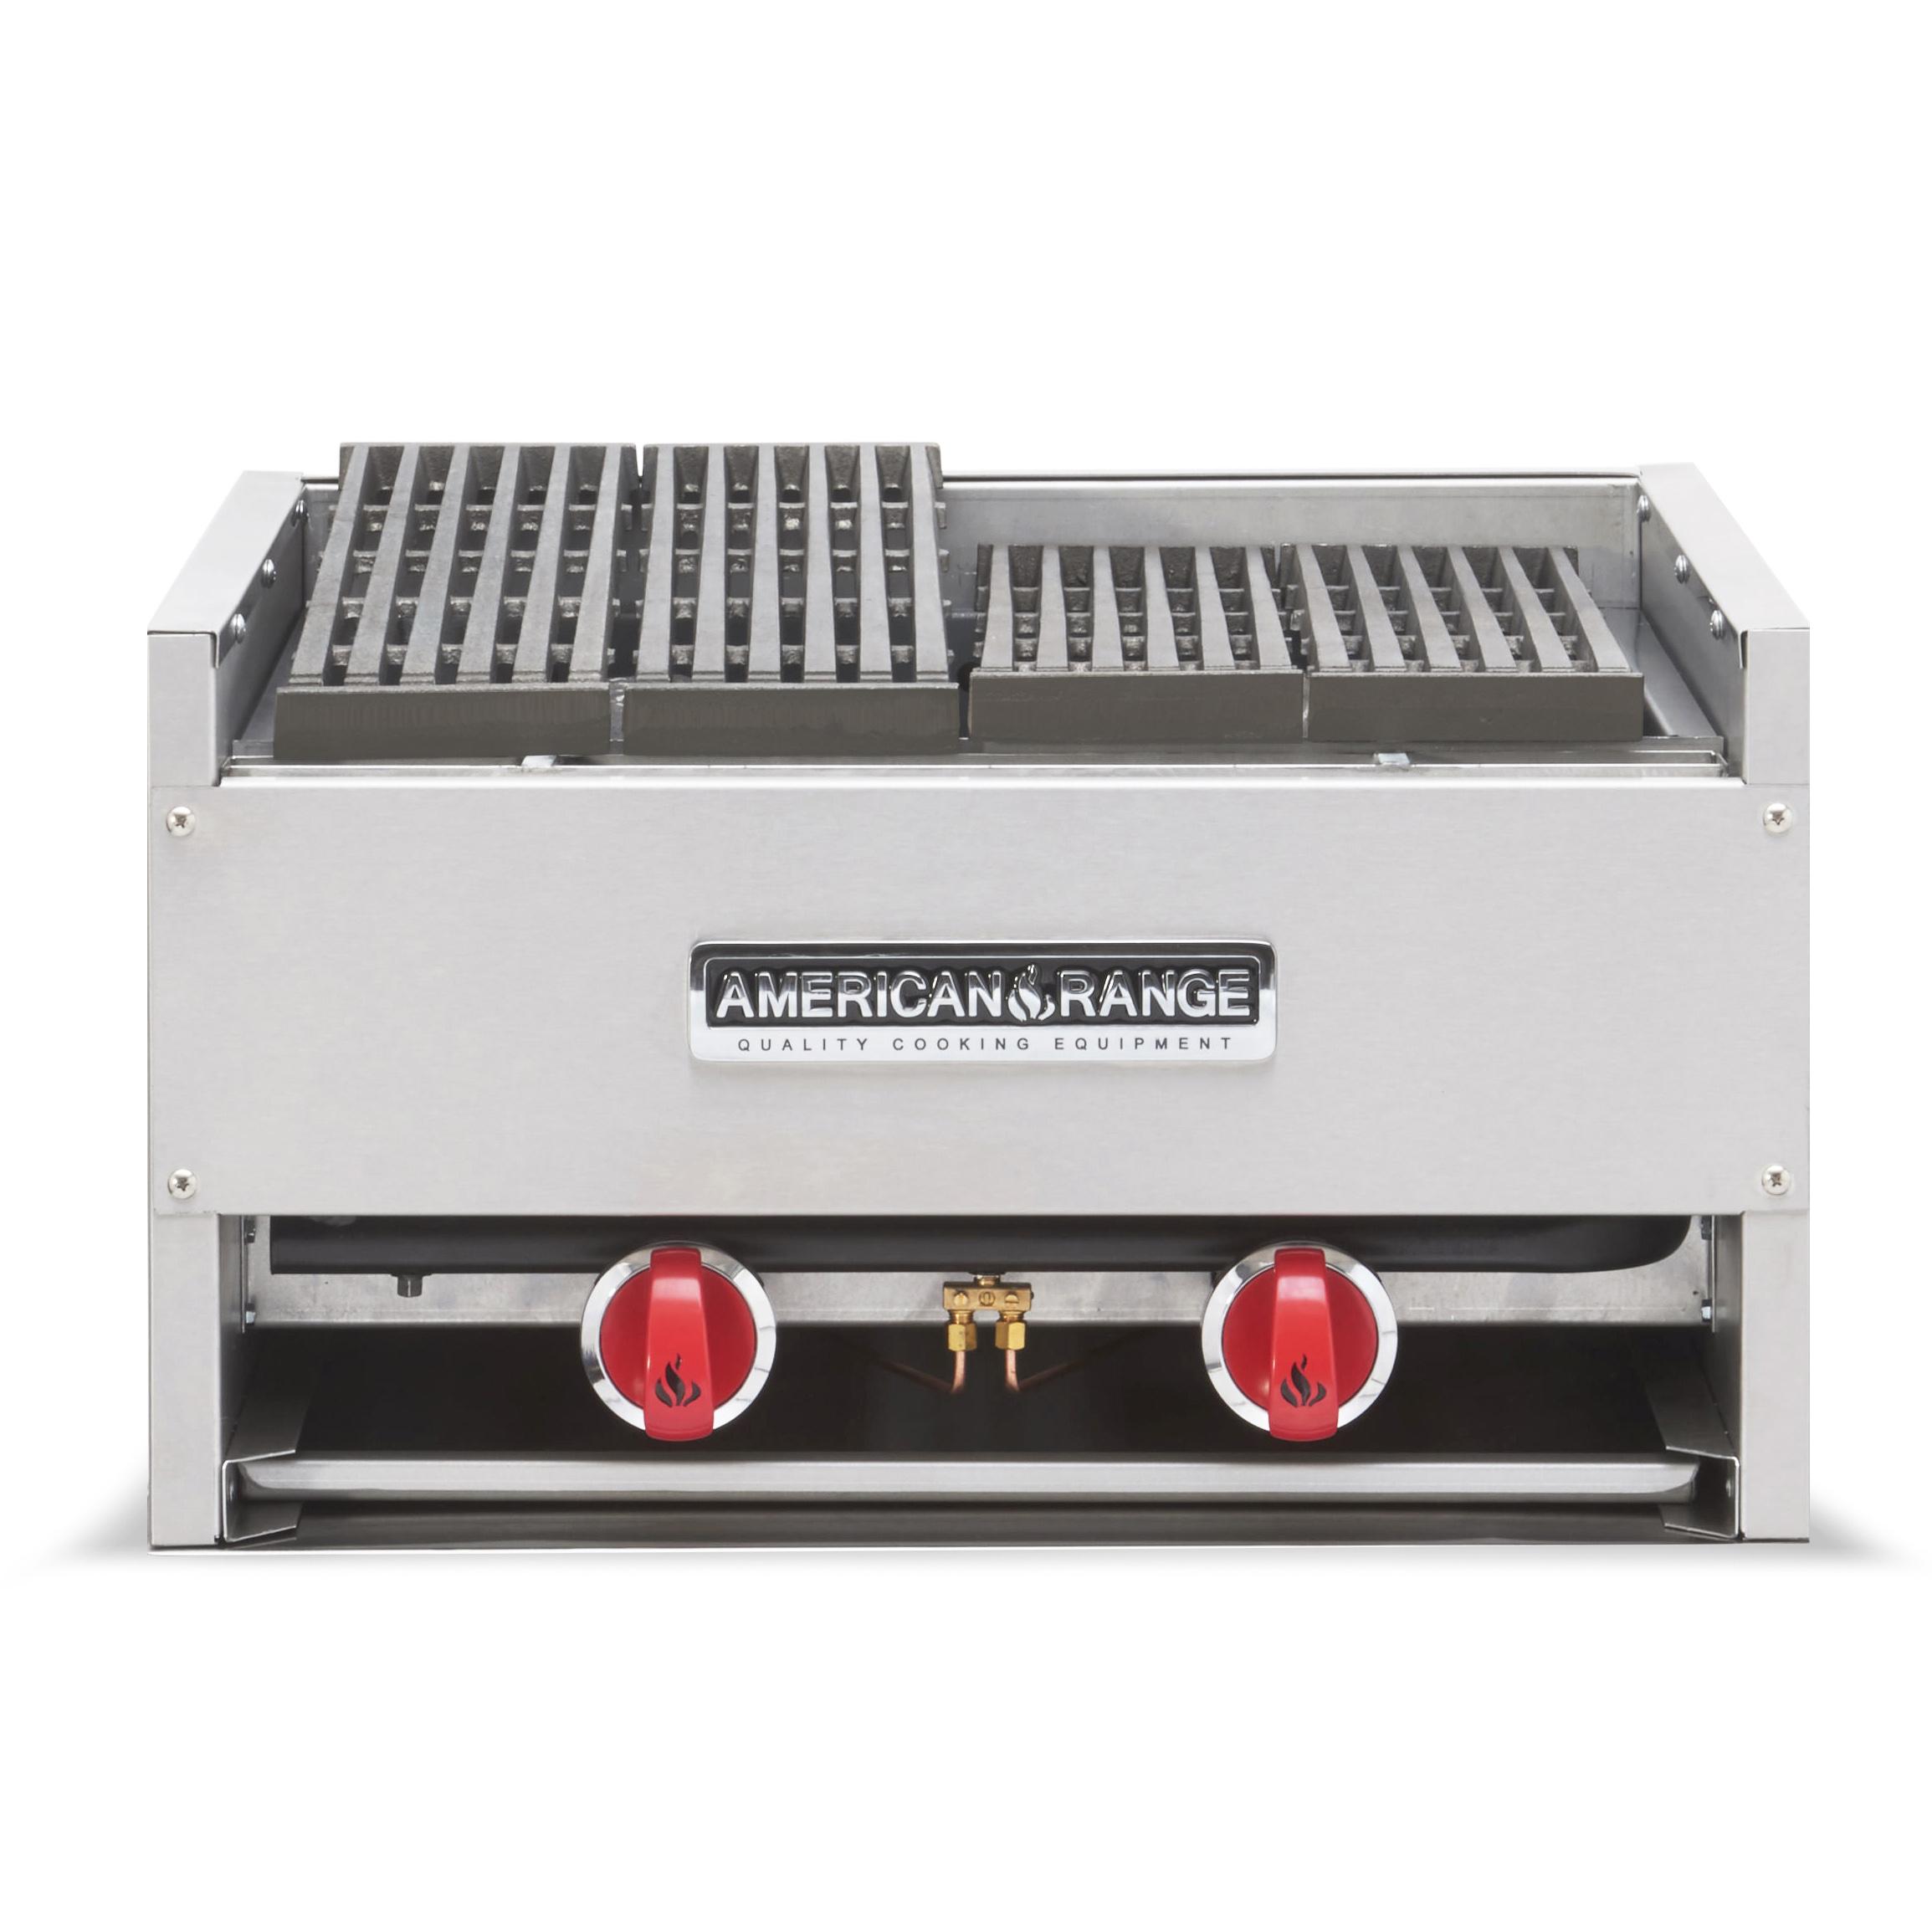 American Range AECB-60 charbroiler, gas, countertop